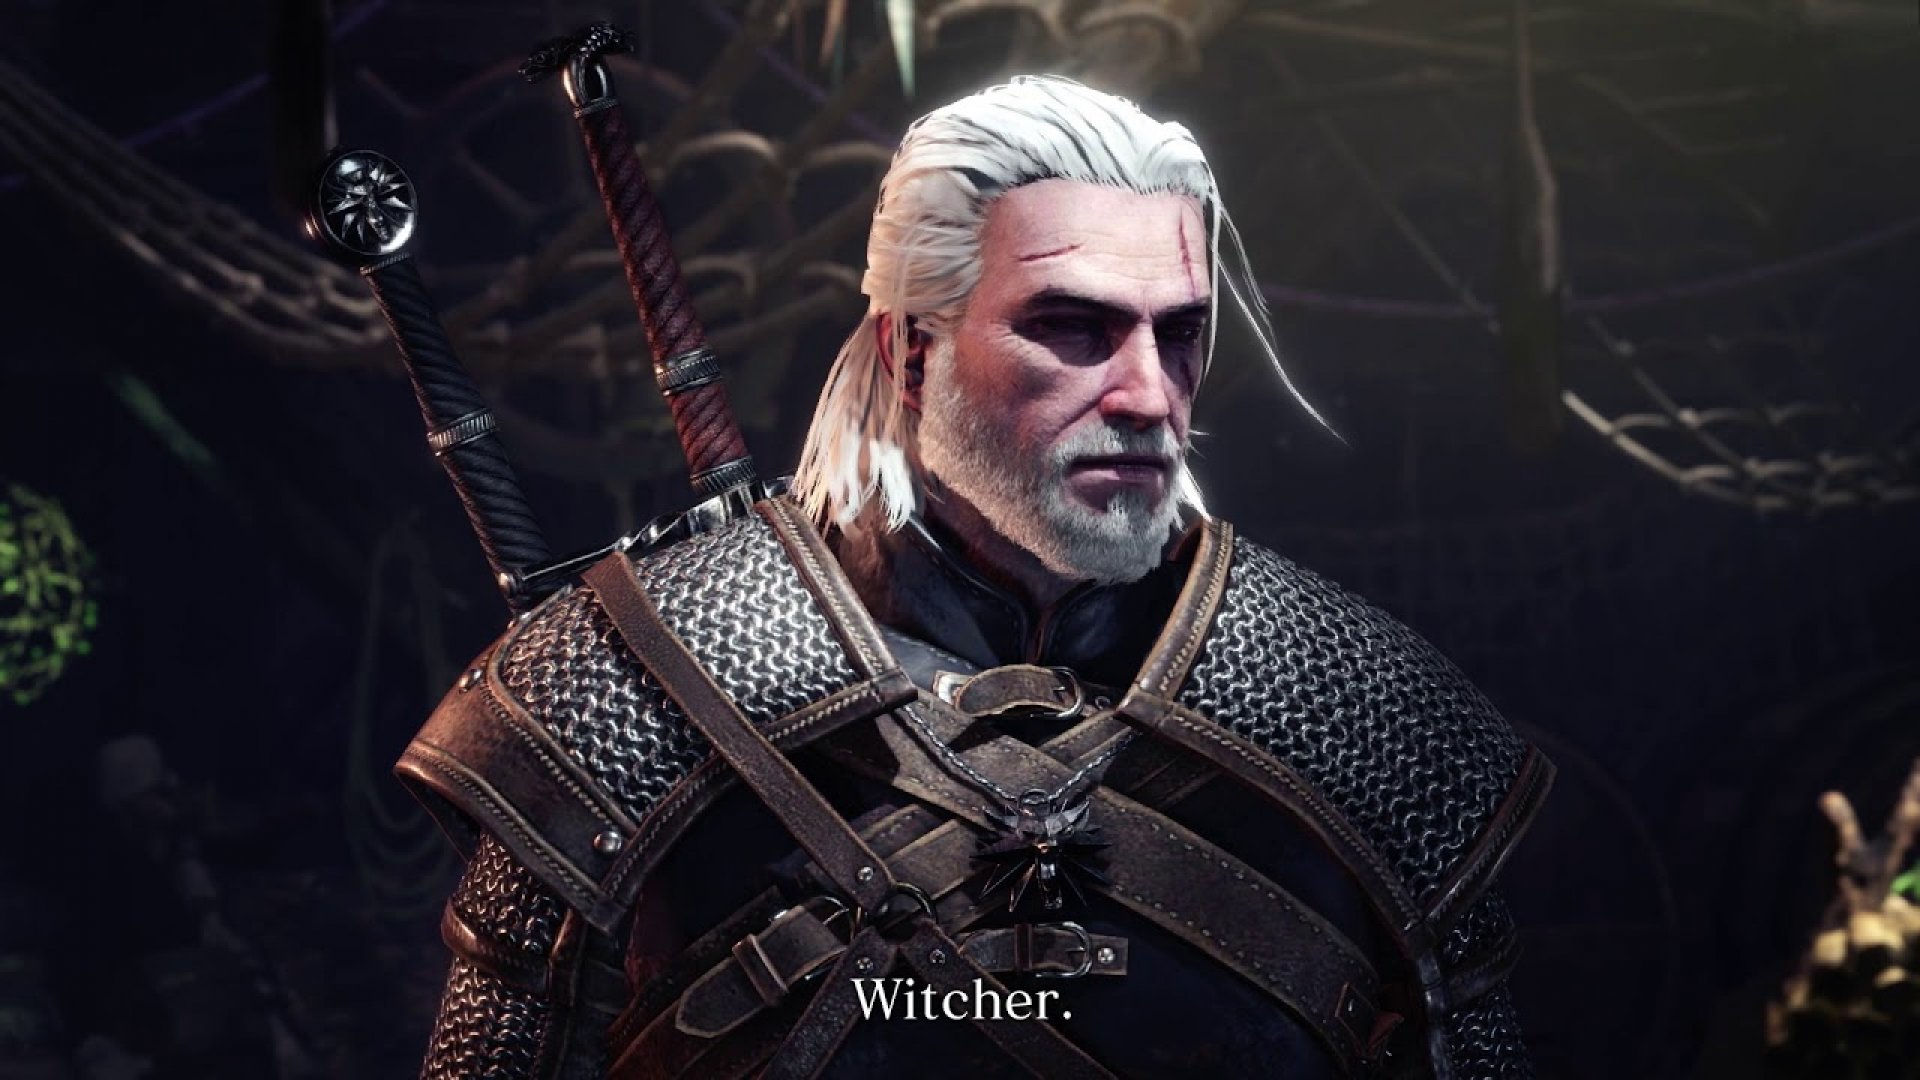 Monster Hunter World The Witcher 3 Capcom Geralt